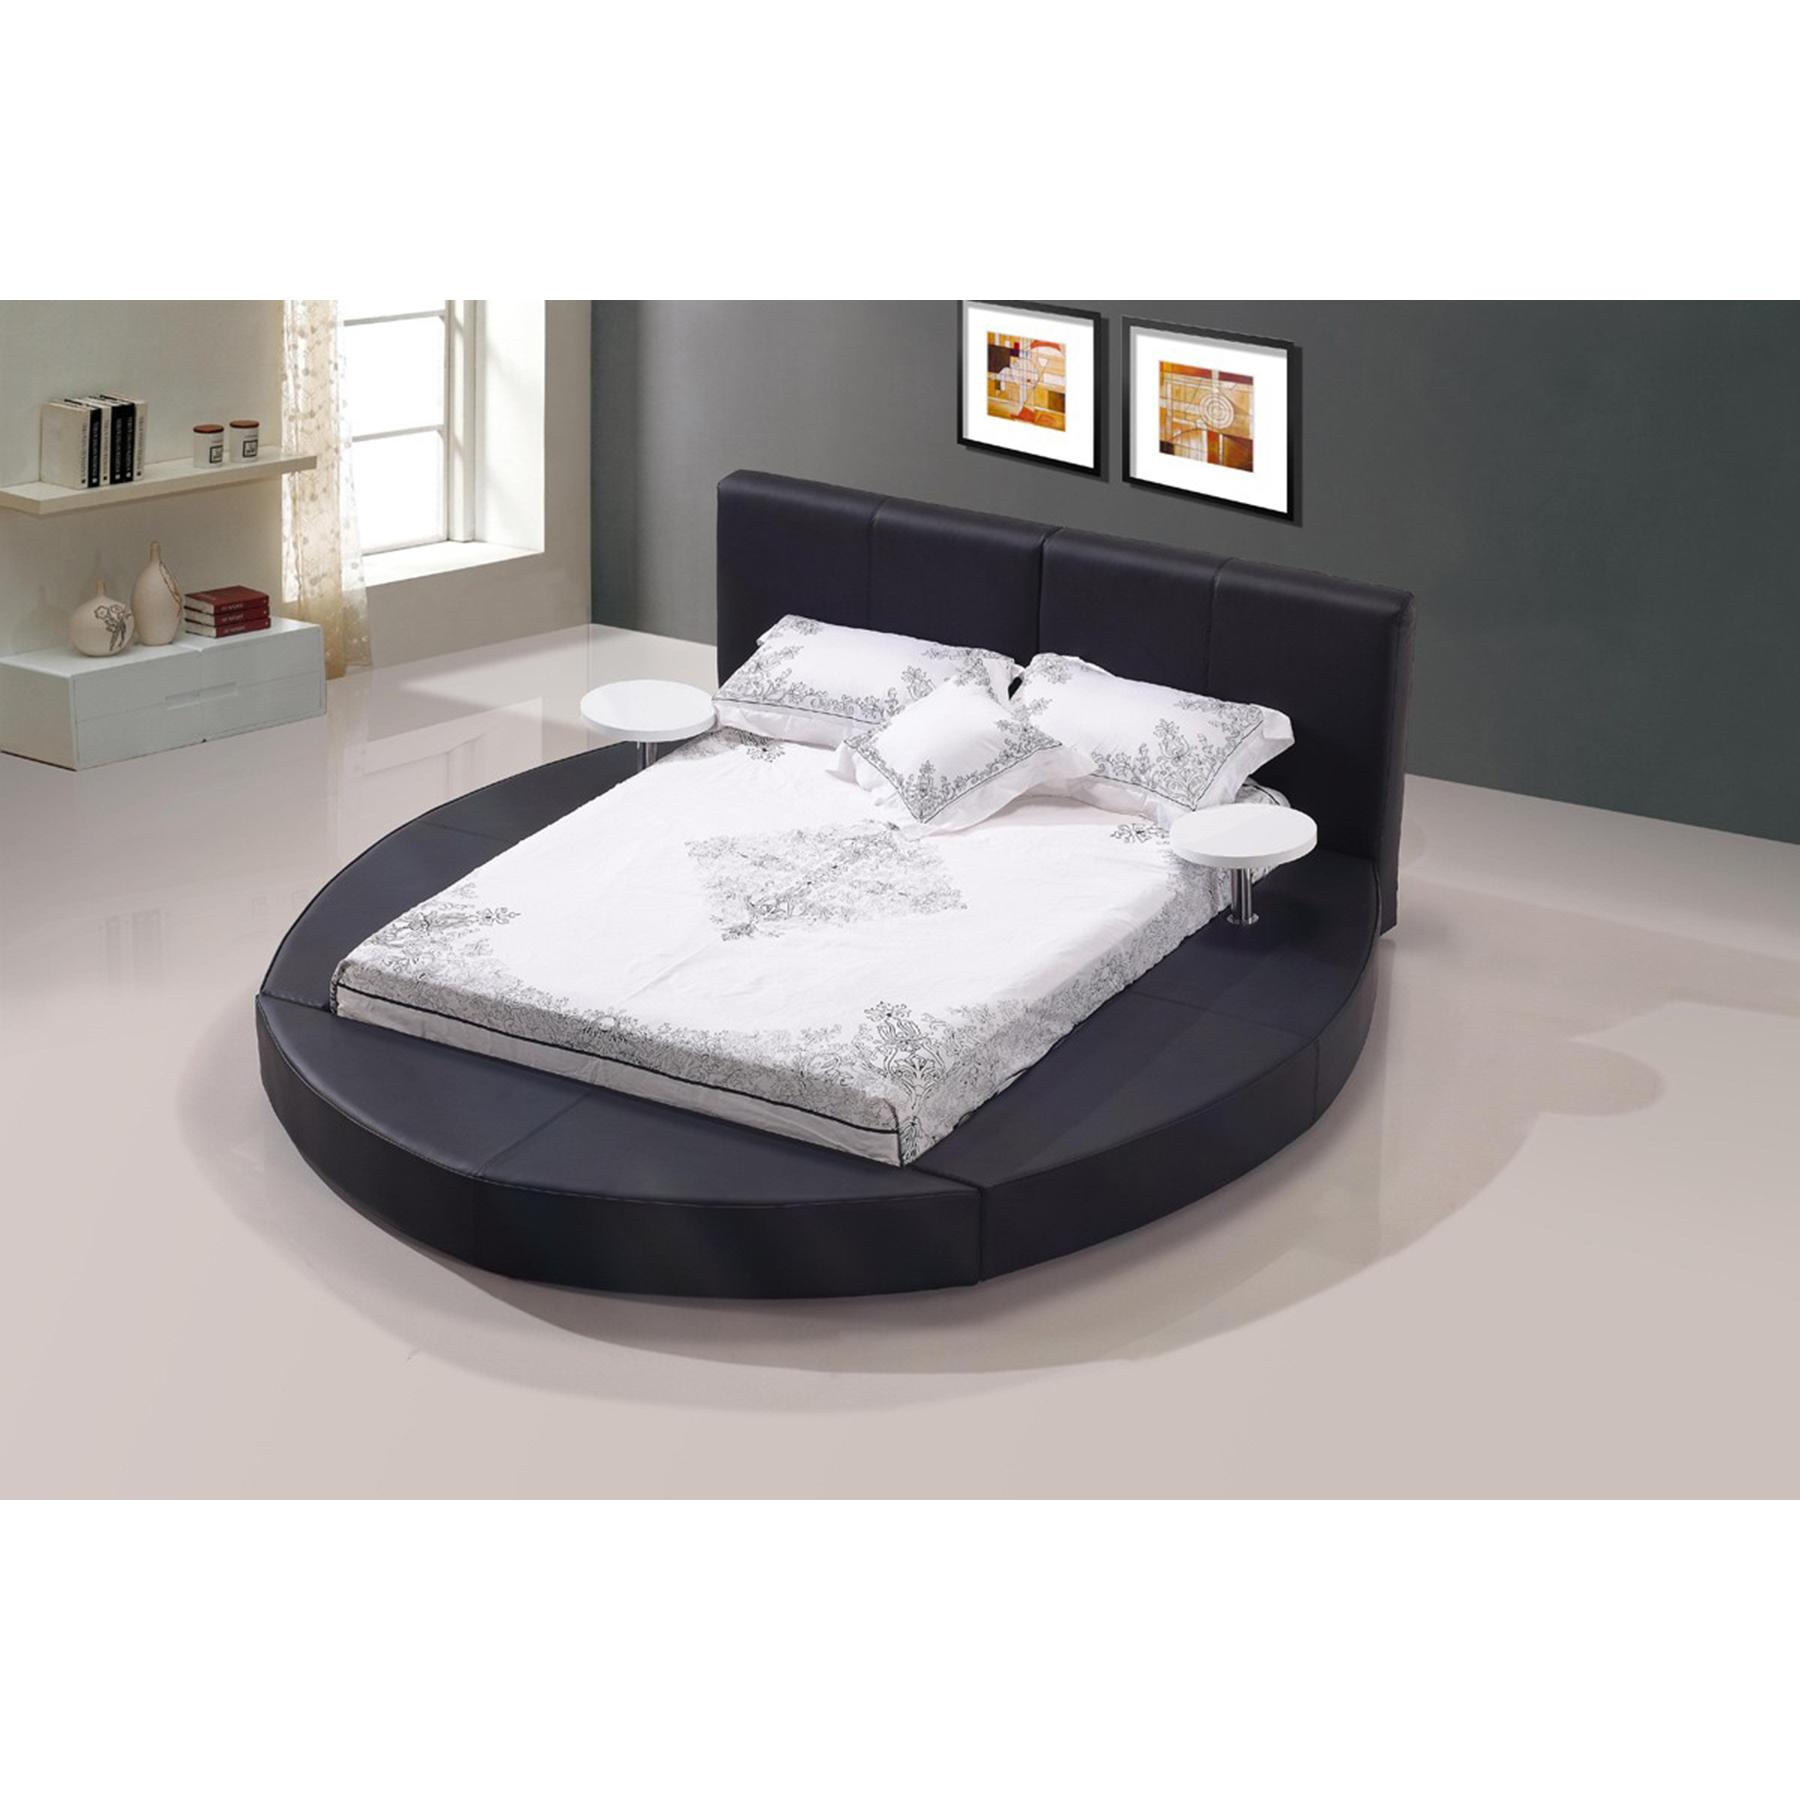 modrest atlas modern bonded leather round bed black dcg stores rh dcgstores com